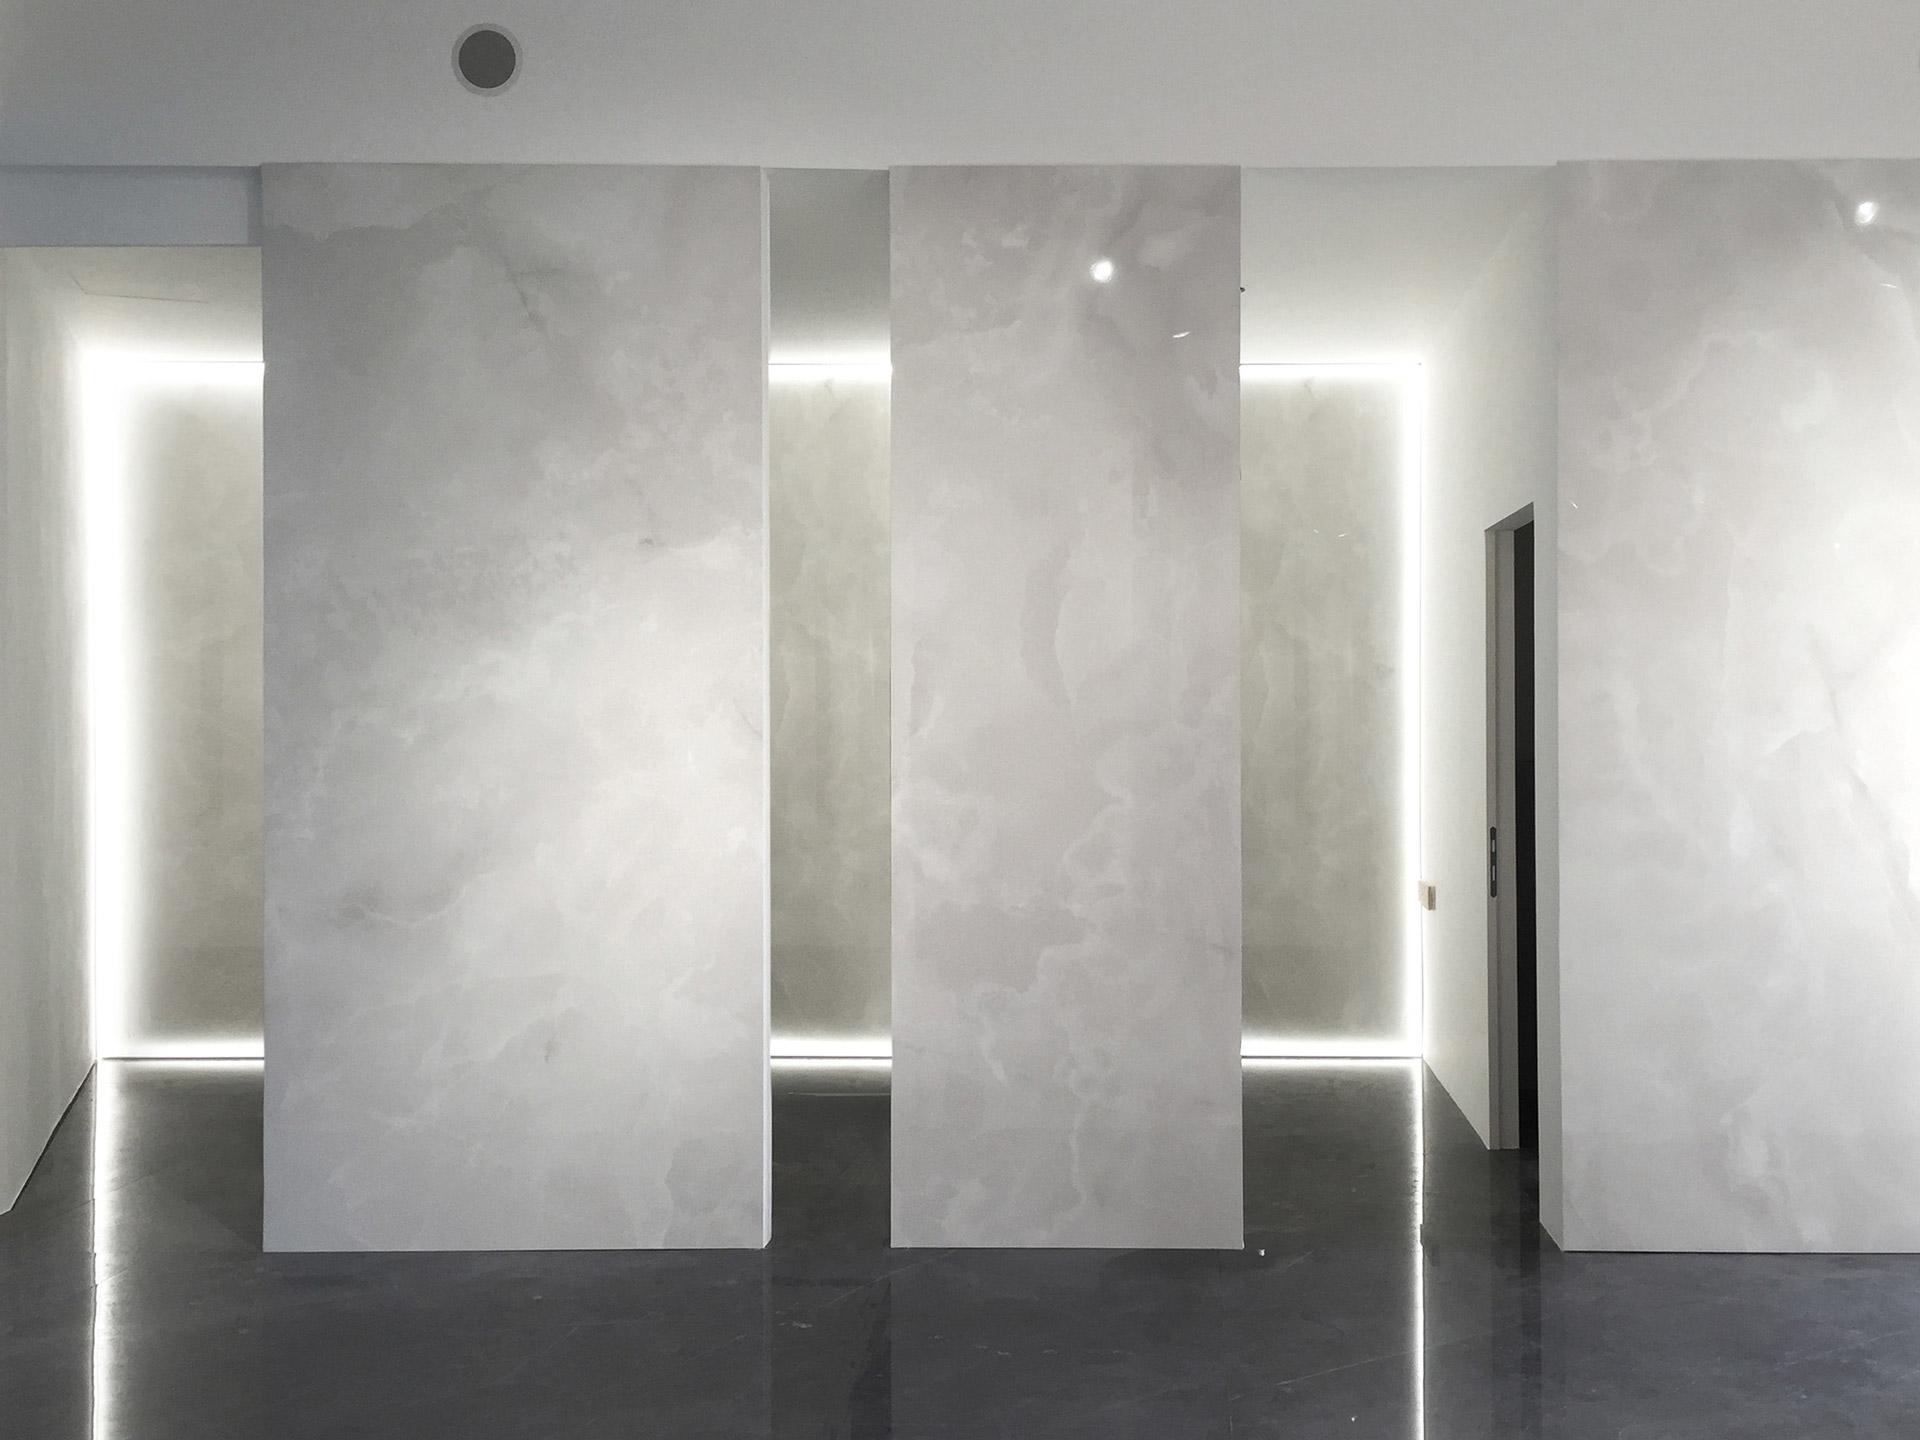 porcelain tile images: Onyx Sense range high quality photo